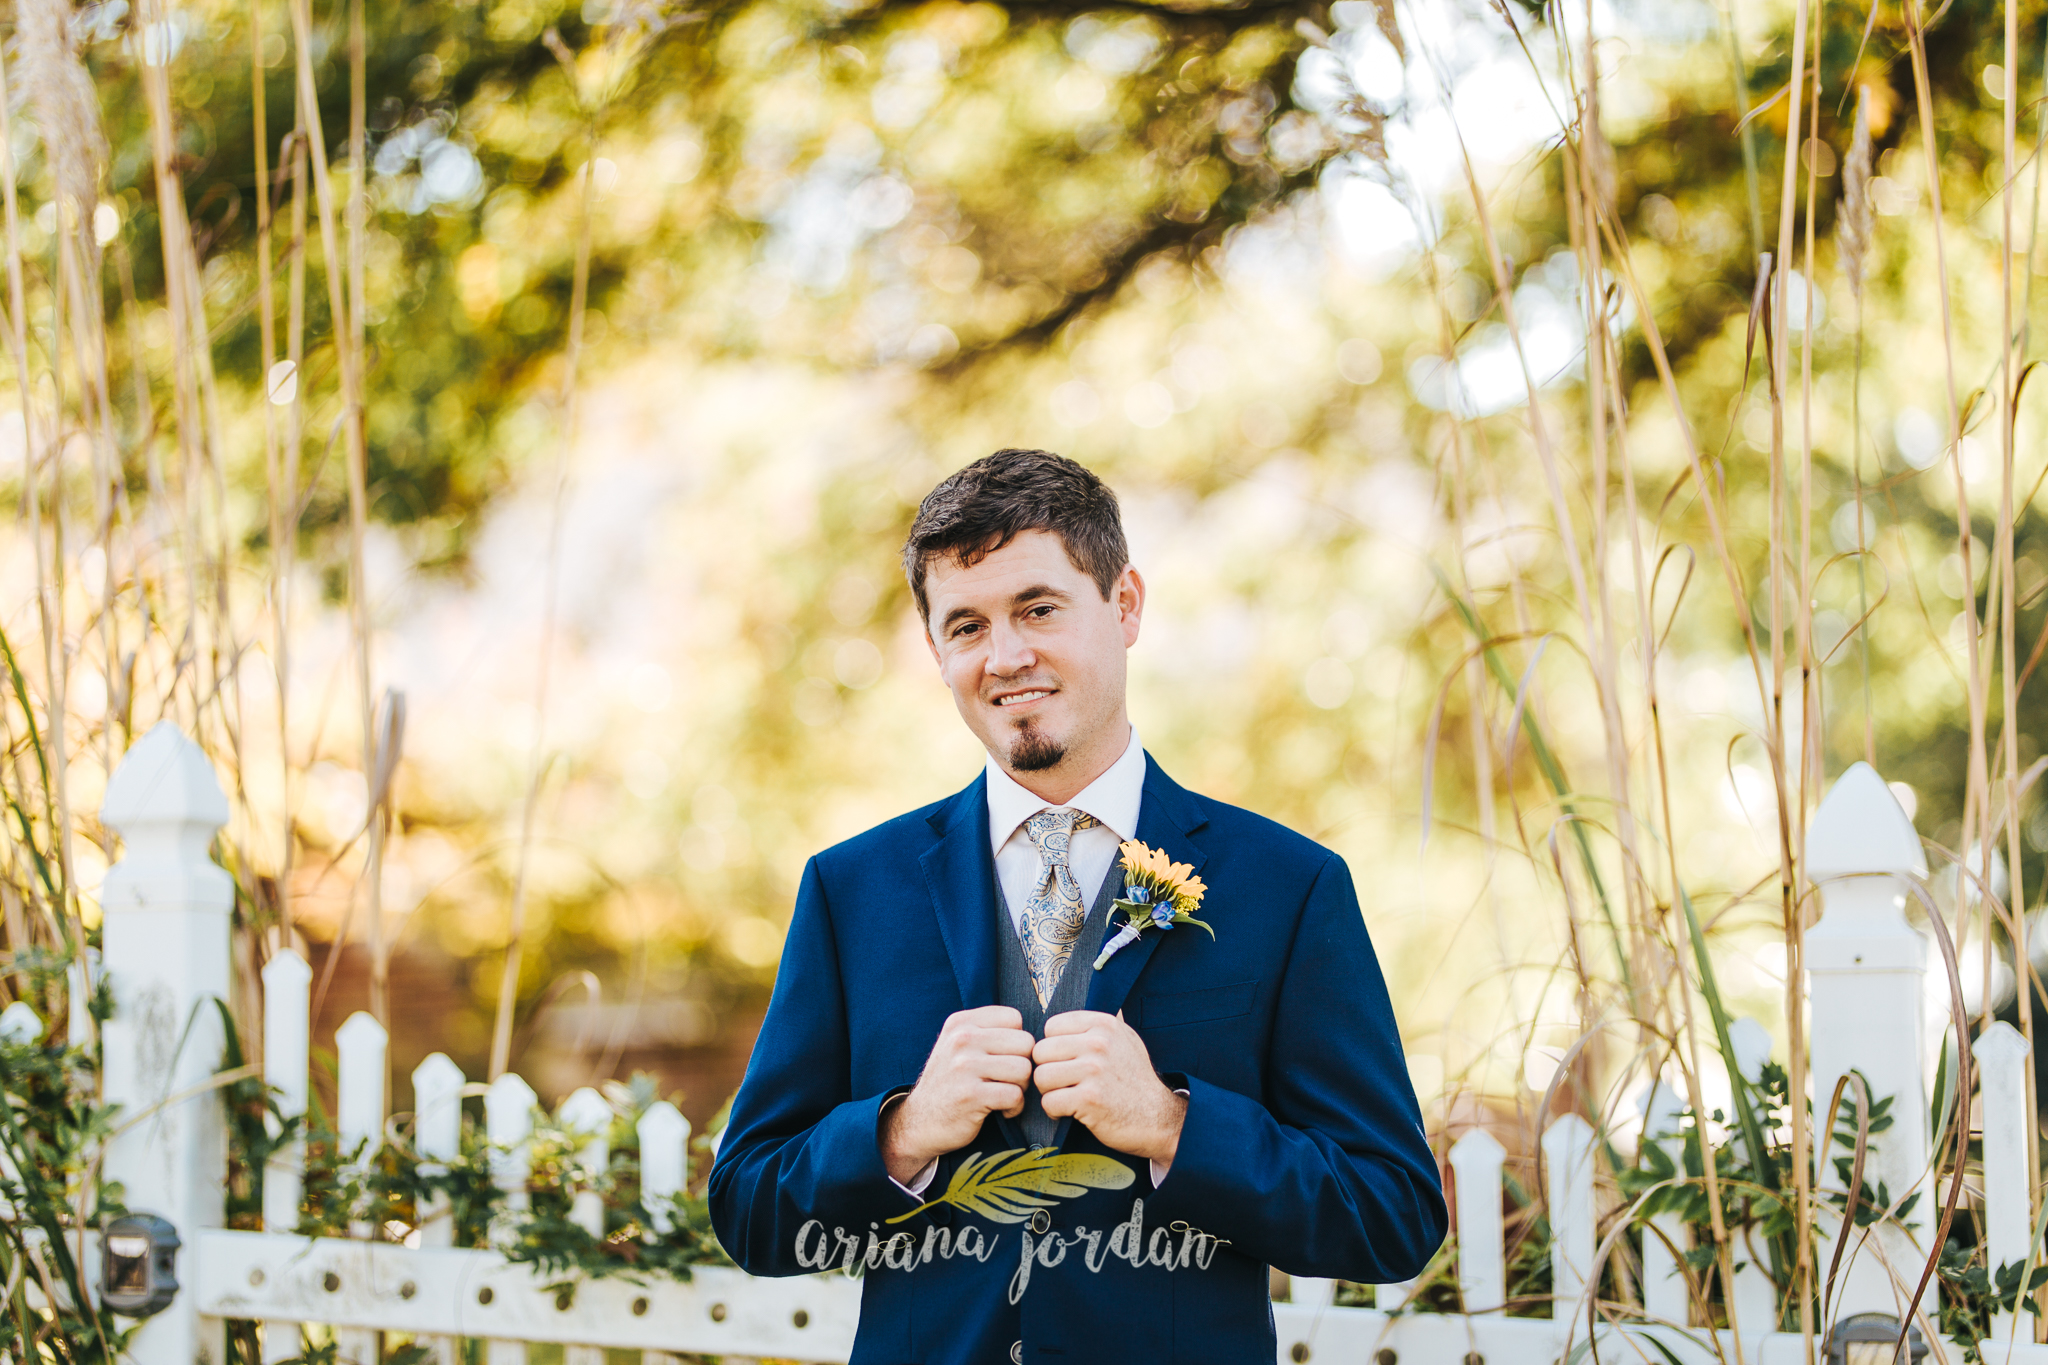 028 Ariana Jordan Photography -Moonlight Fields Lexington Ky Wedding Photographer 4202.jpg